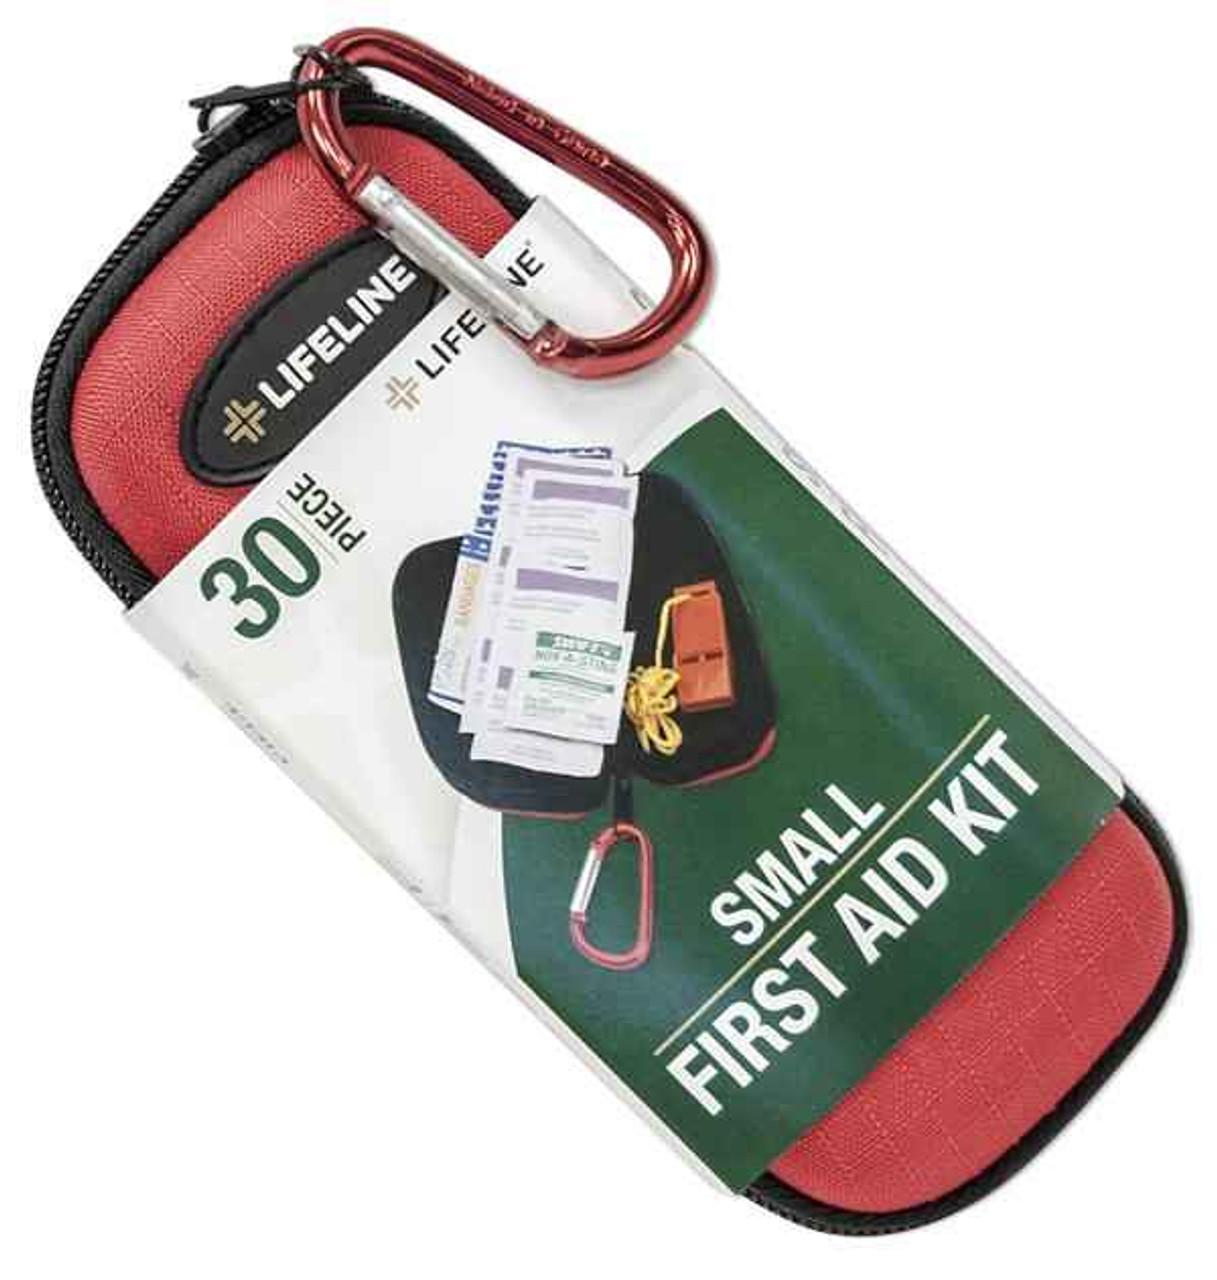 LifeLine Small Hard Shell First Aid Kit